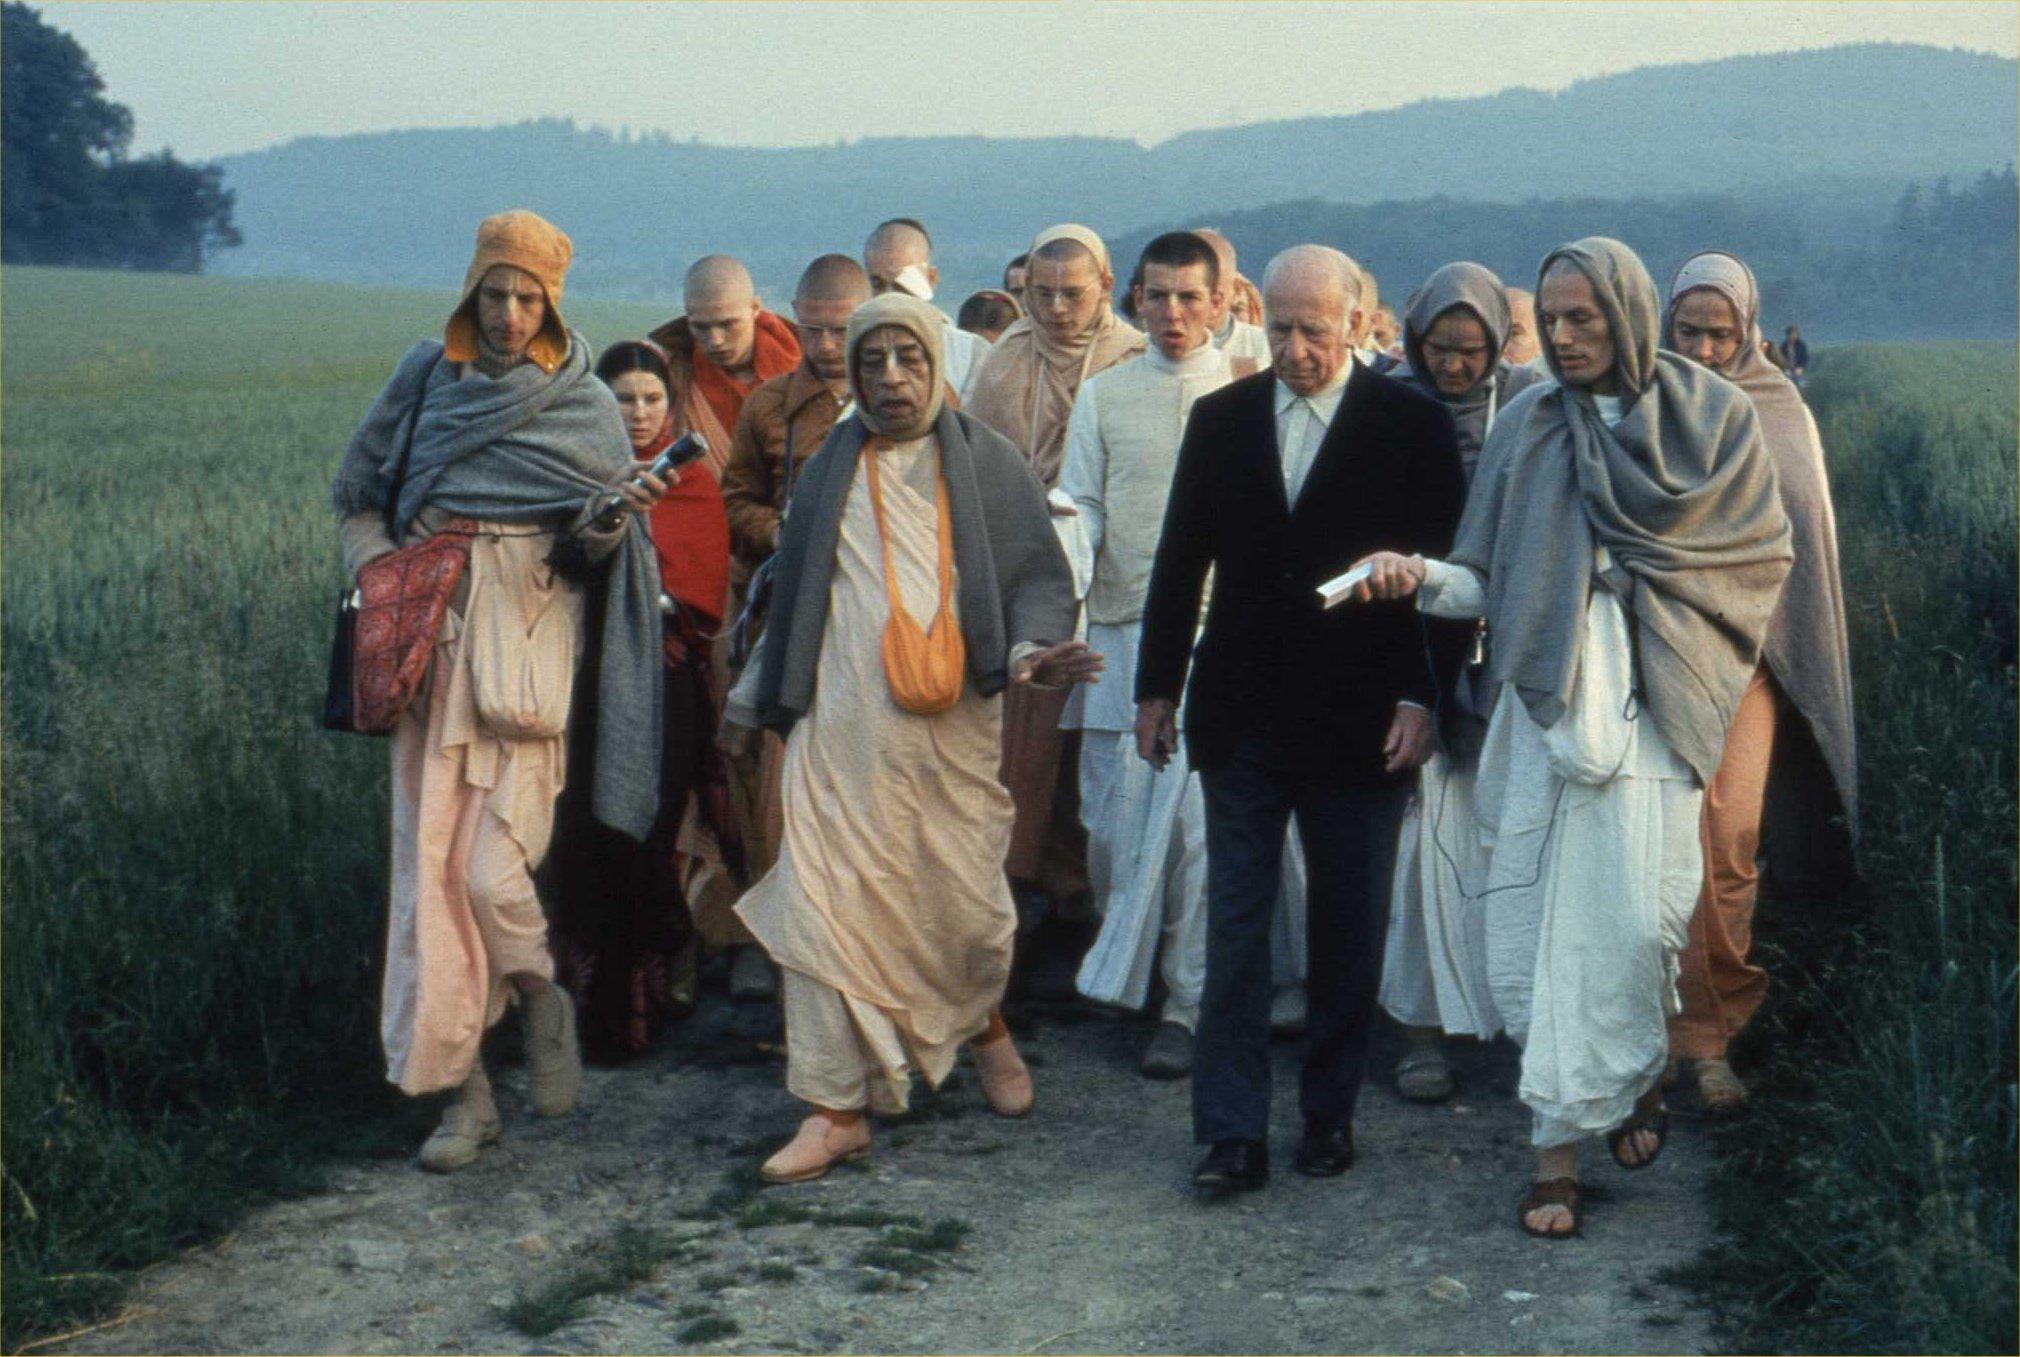 Dürckheim on a morning walk with Swami Prabhupada in Frankfurt in June 1974.